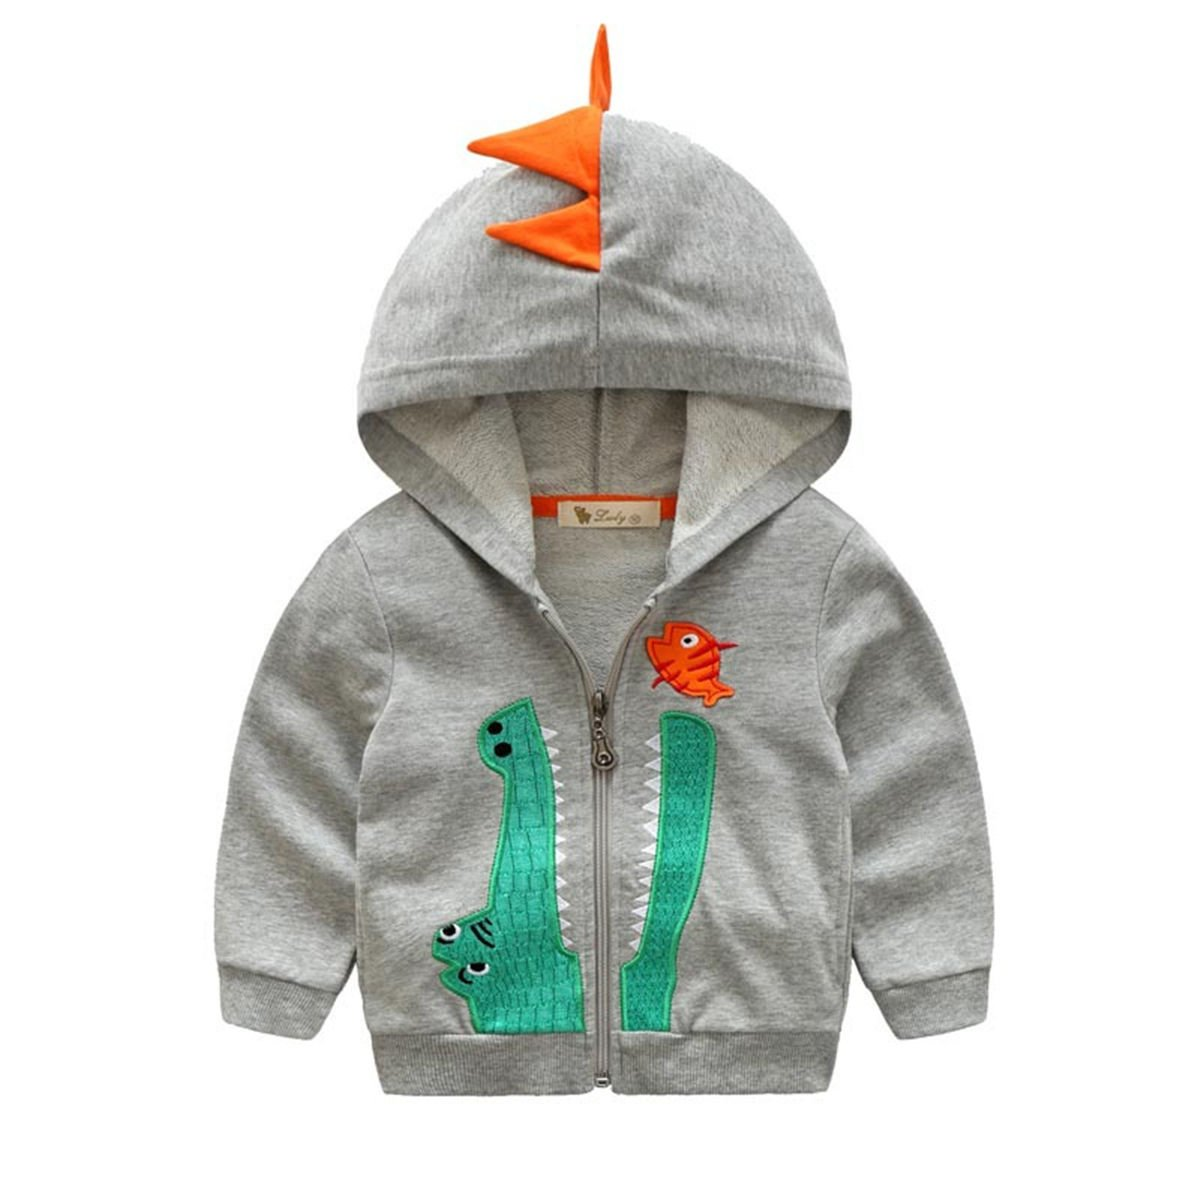 Dealone Baby Boys Long Sleeve Dinosaur Hoodies Kids Sweatshirt Toddler Zip-up Jacket Light Gray by Dealone